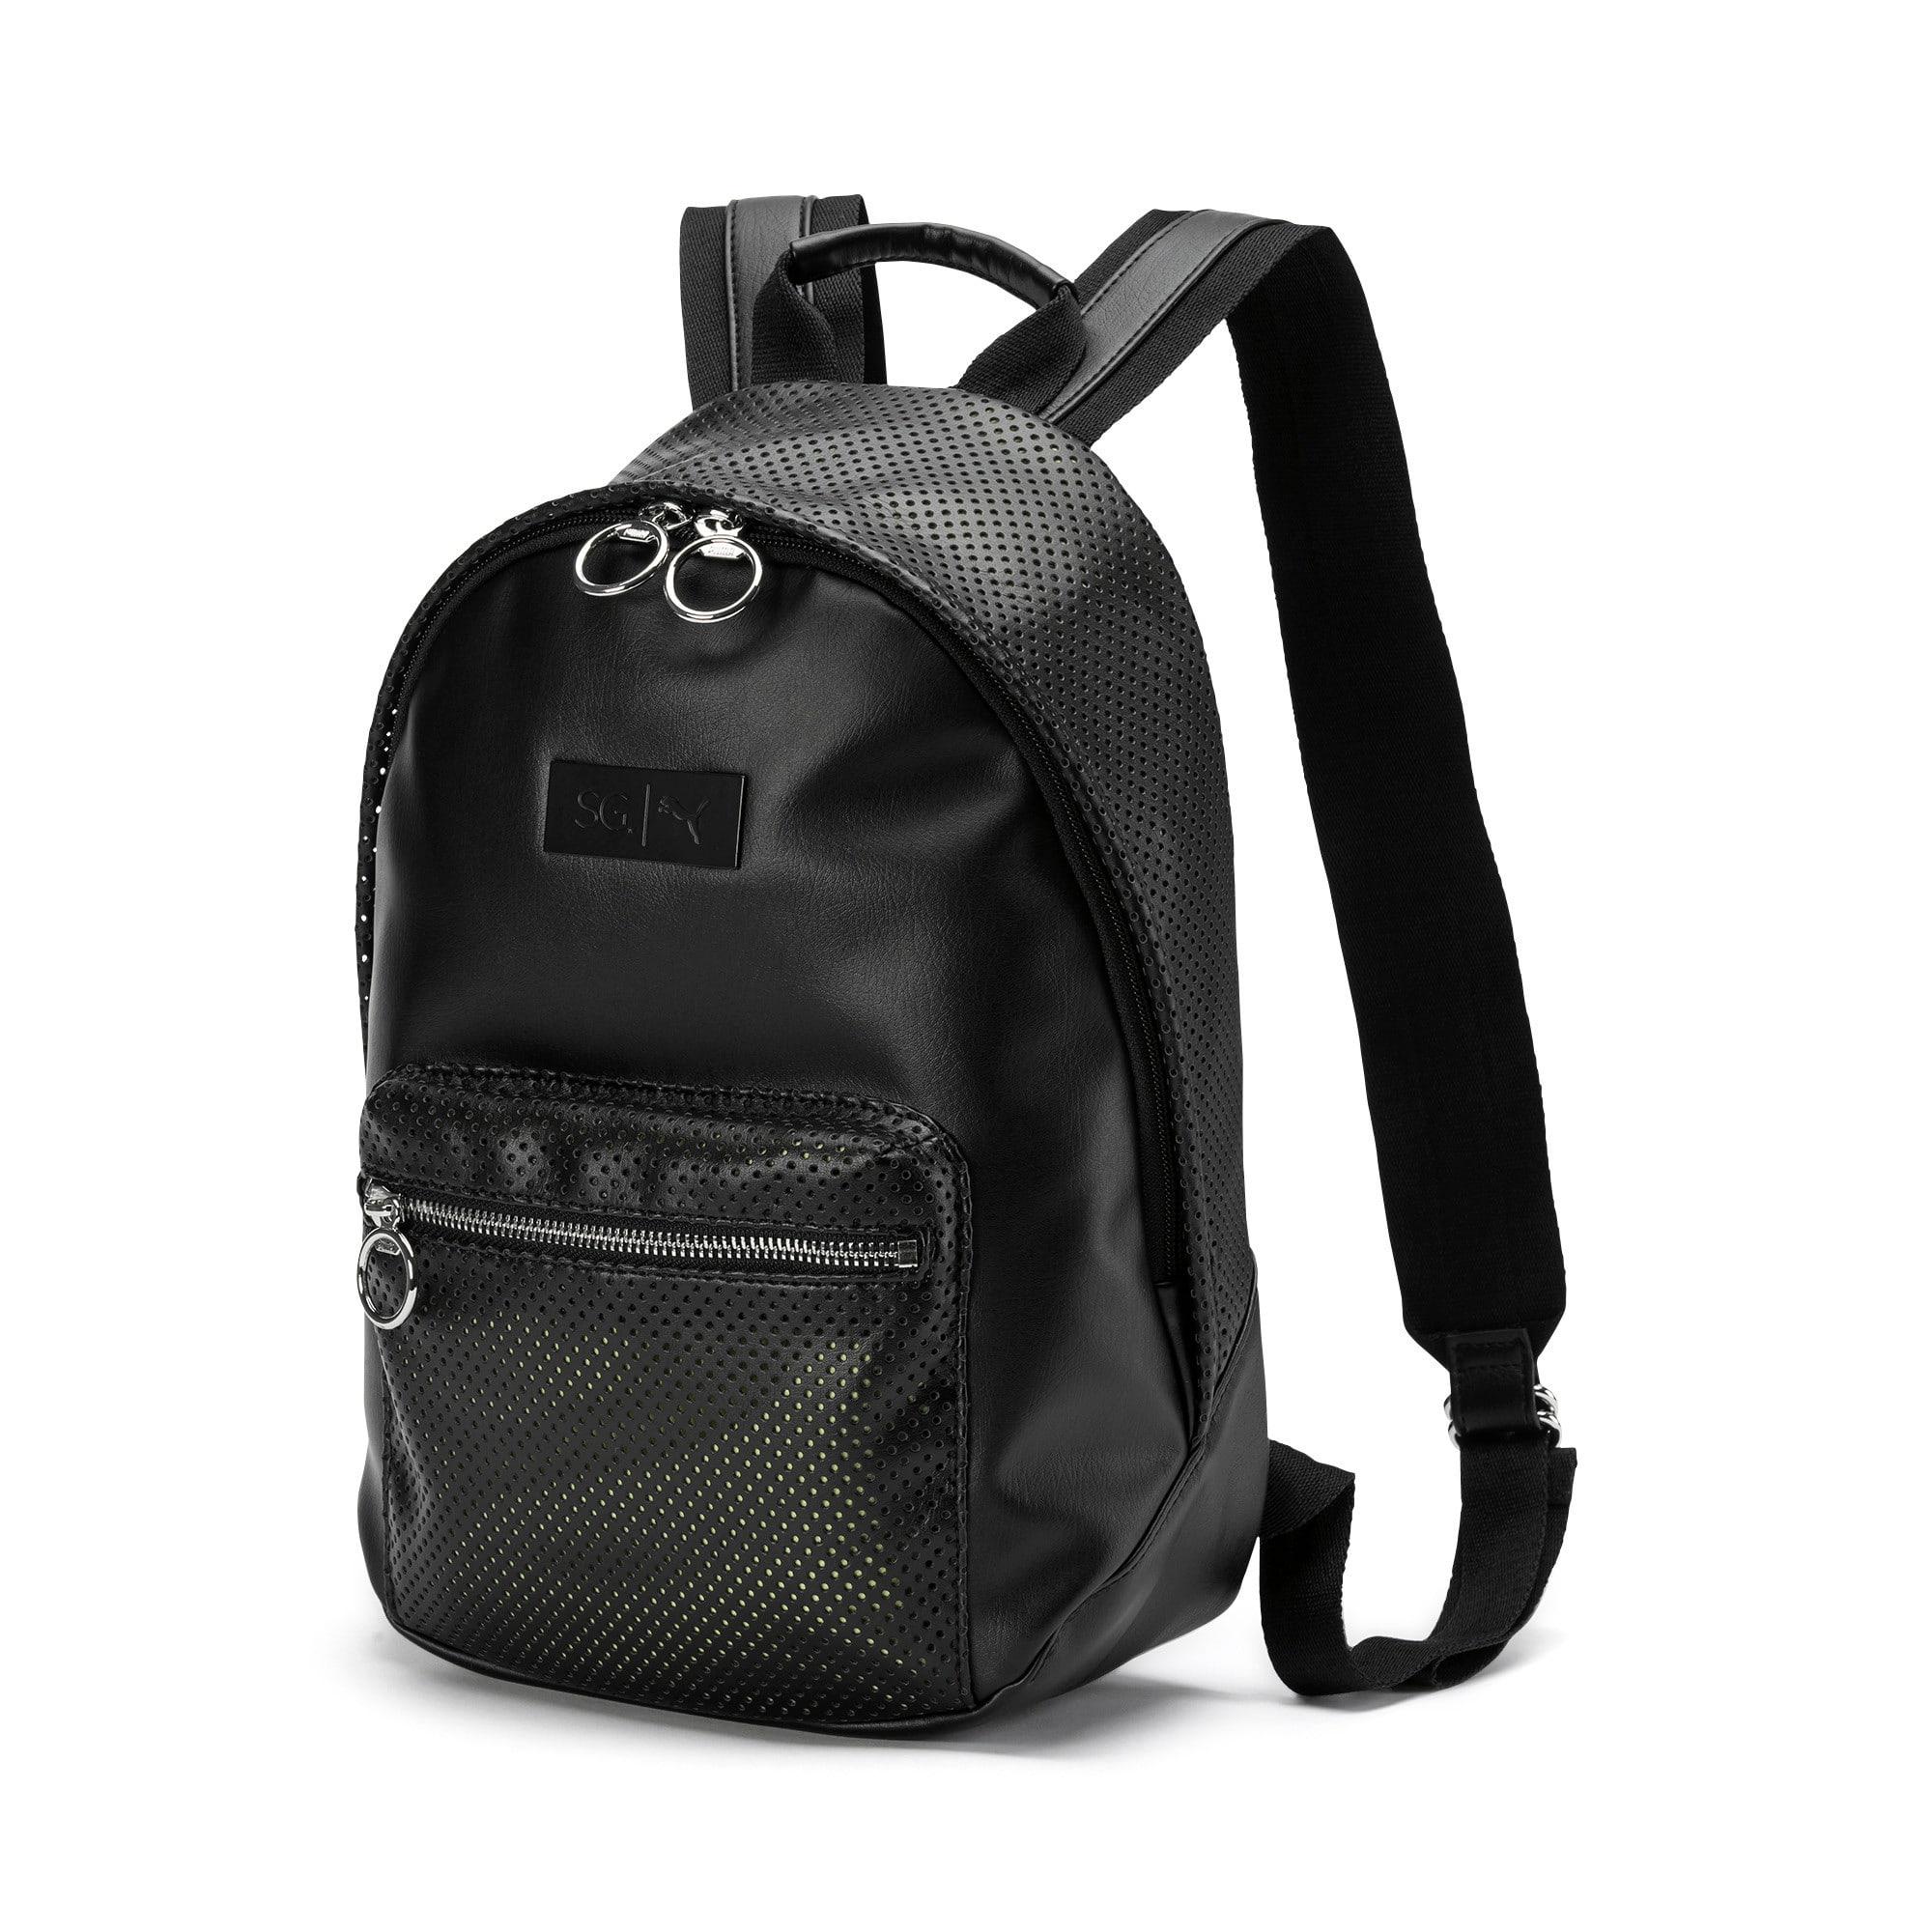 Thumbnail 1 of PUMA x SELENA GOMEZ Style Women's Backpack, Puma Black, medium